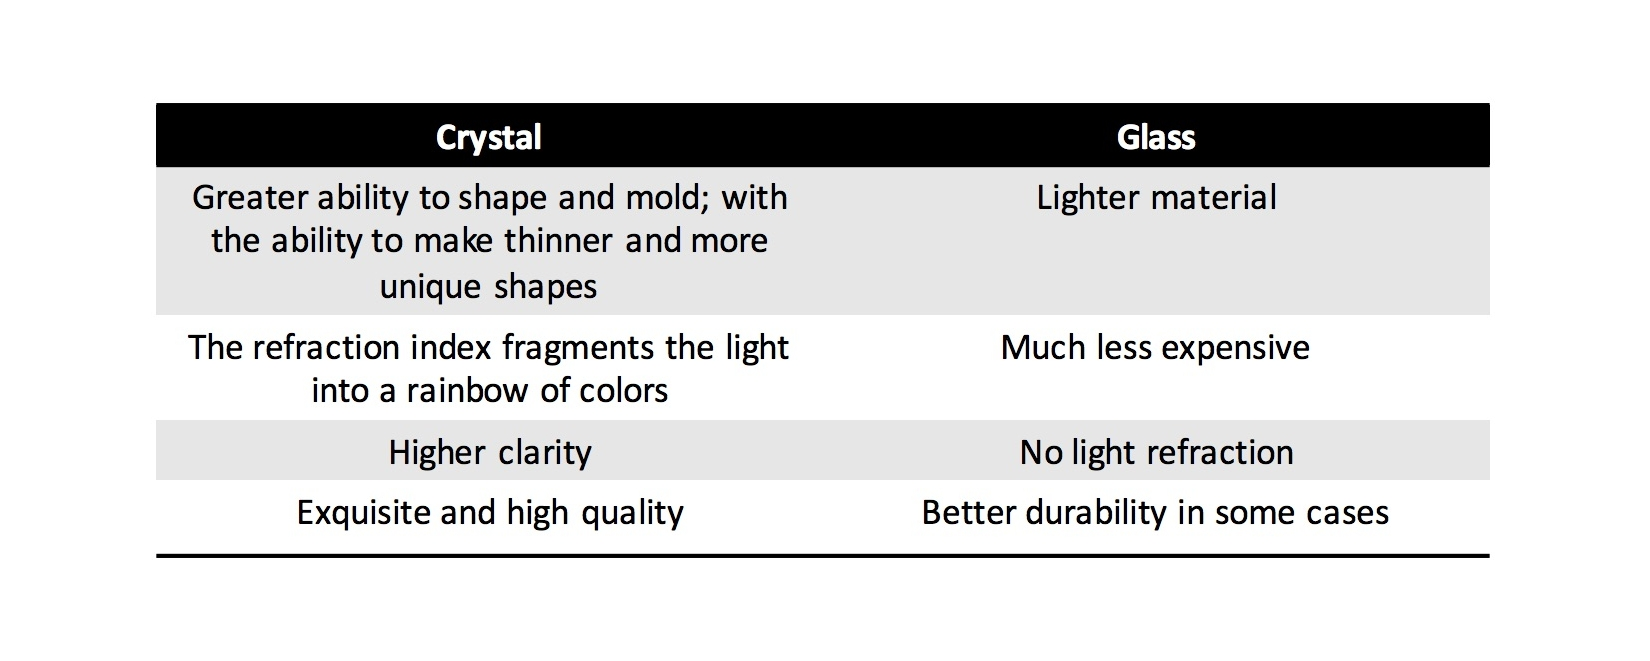 glass vs crystal.jpg